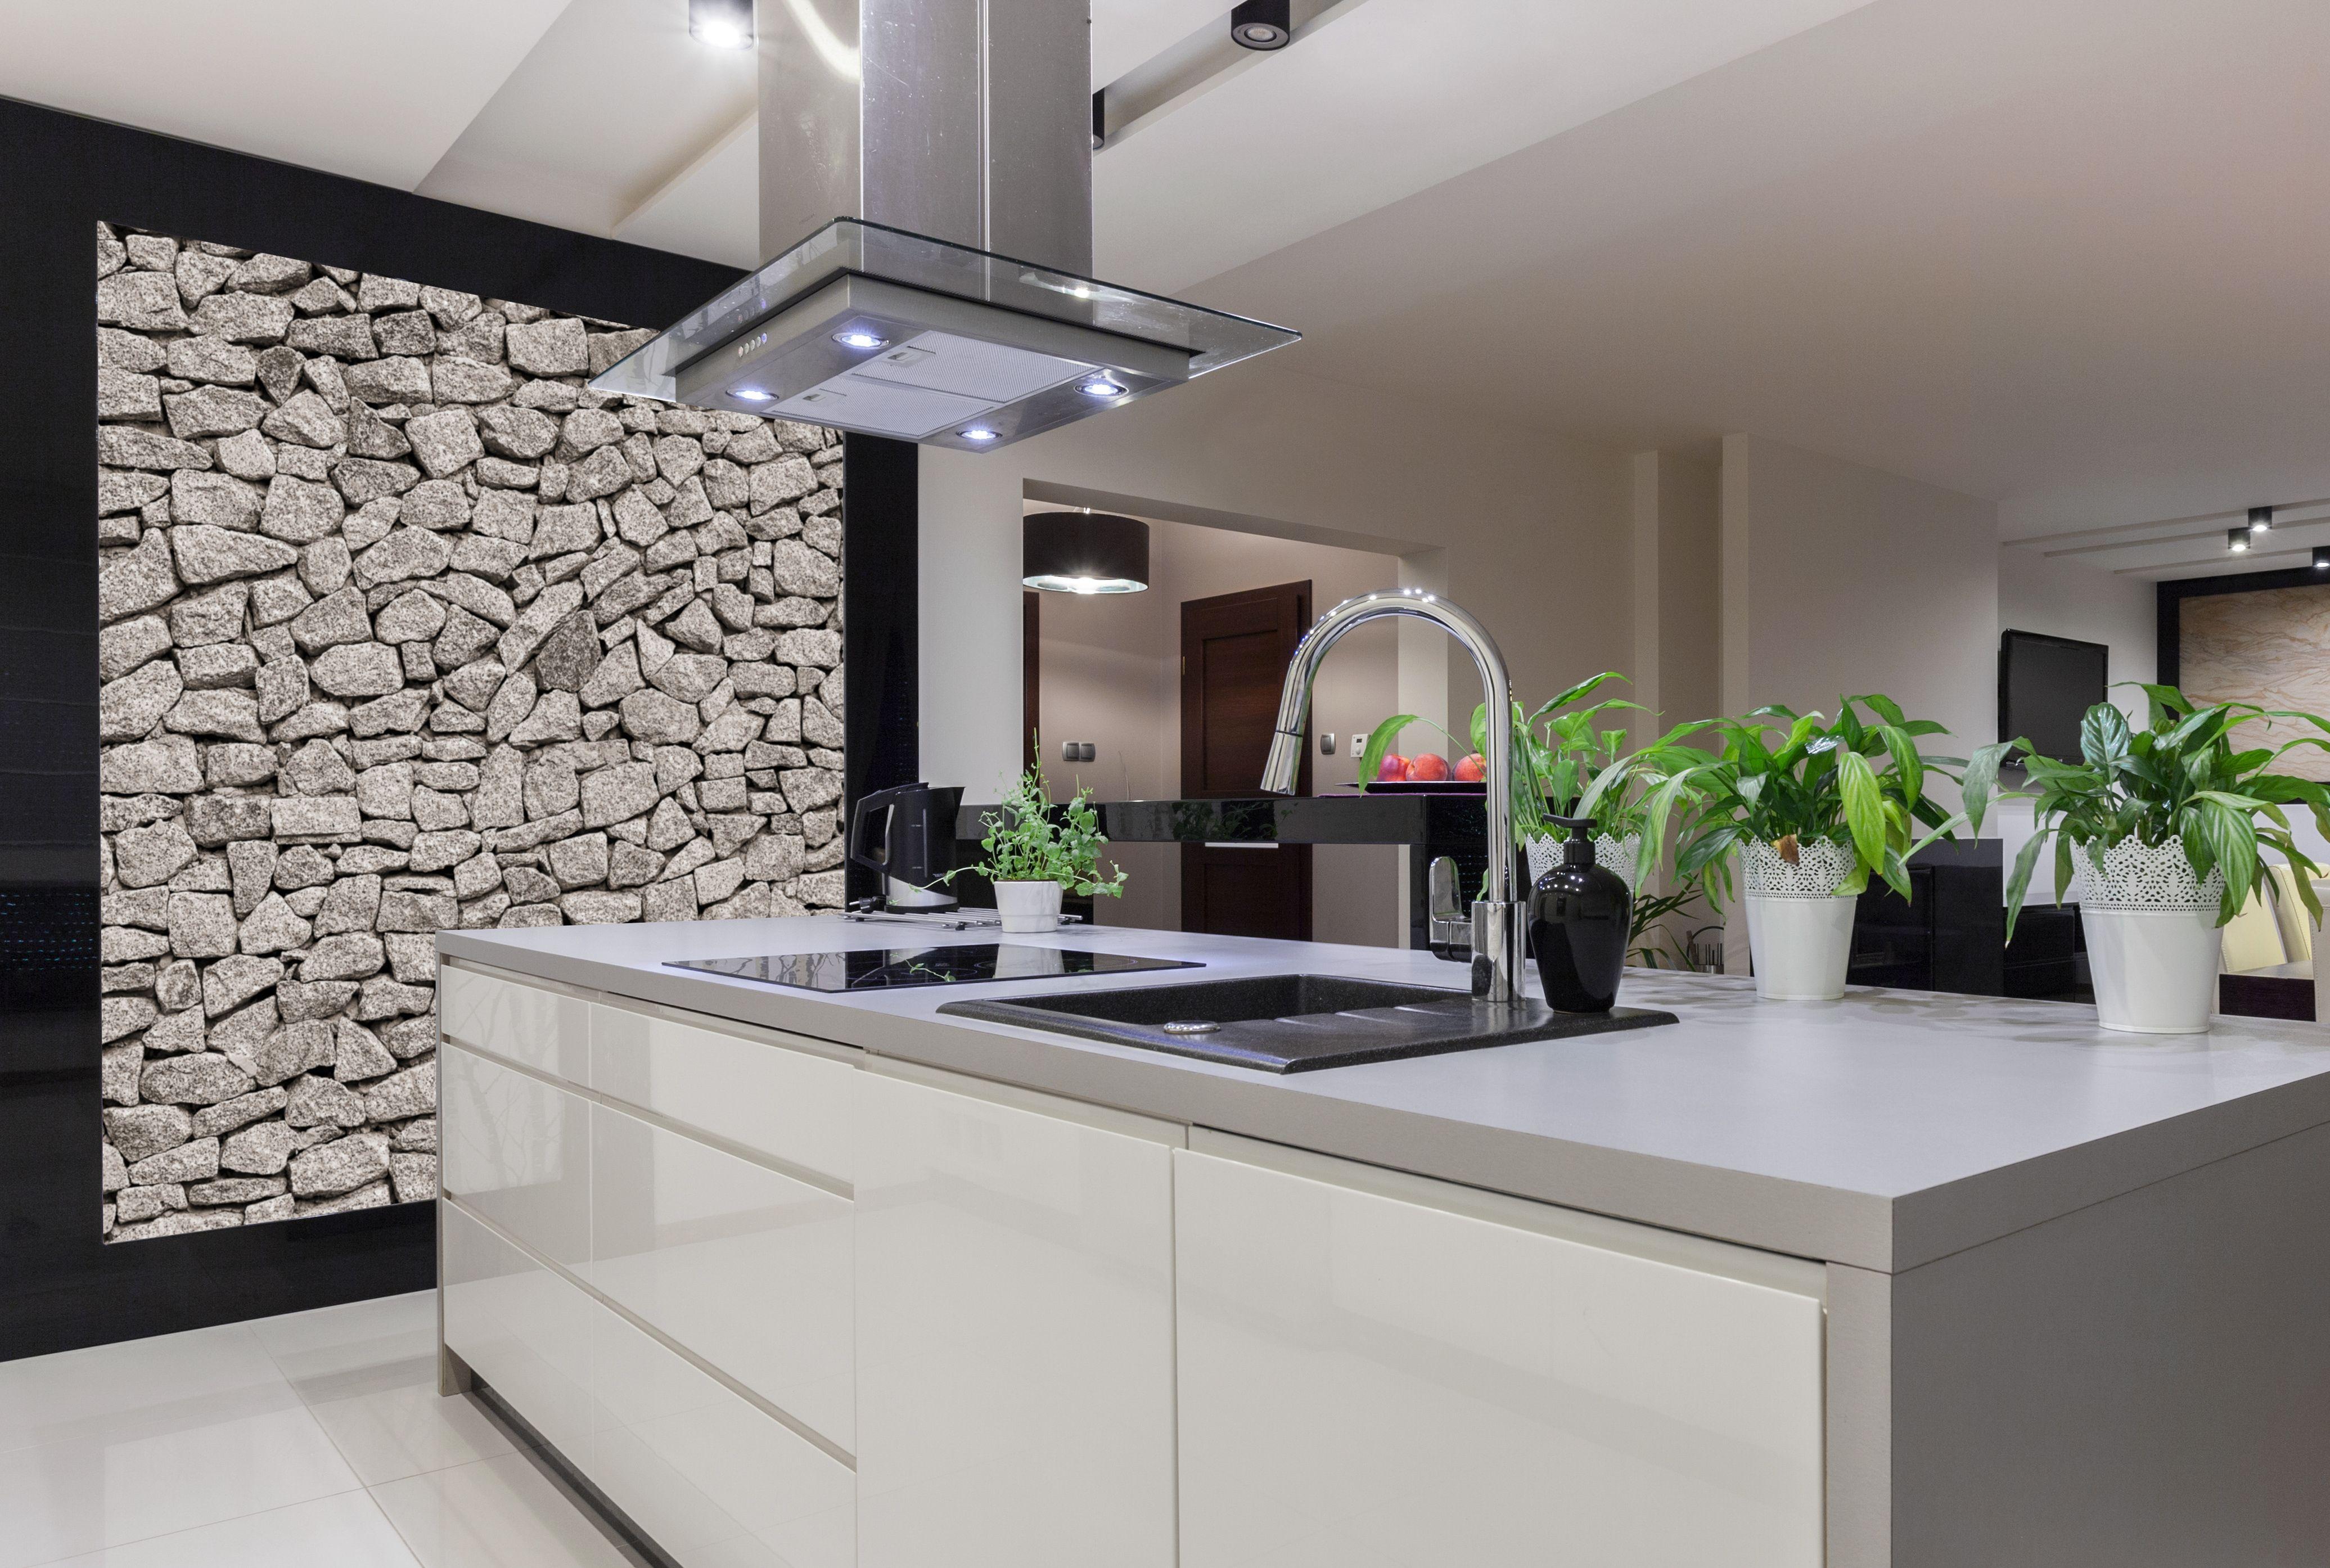 Nowoczesna Biala Drewniana Kuchnia Na Wysoki Polysk Z Szarym Blatem Kuchennym Na Wyspie Ni White Modern Kitchen Custom Kitchens Design Luxury Kitchen Design